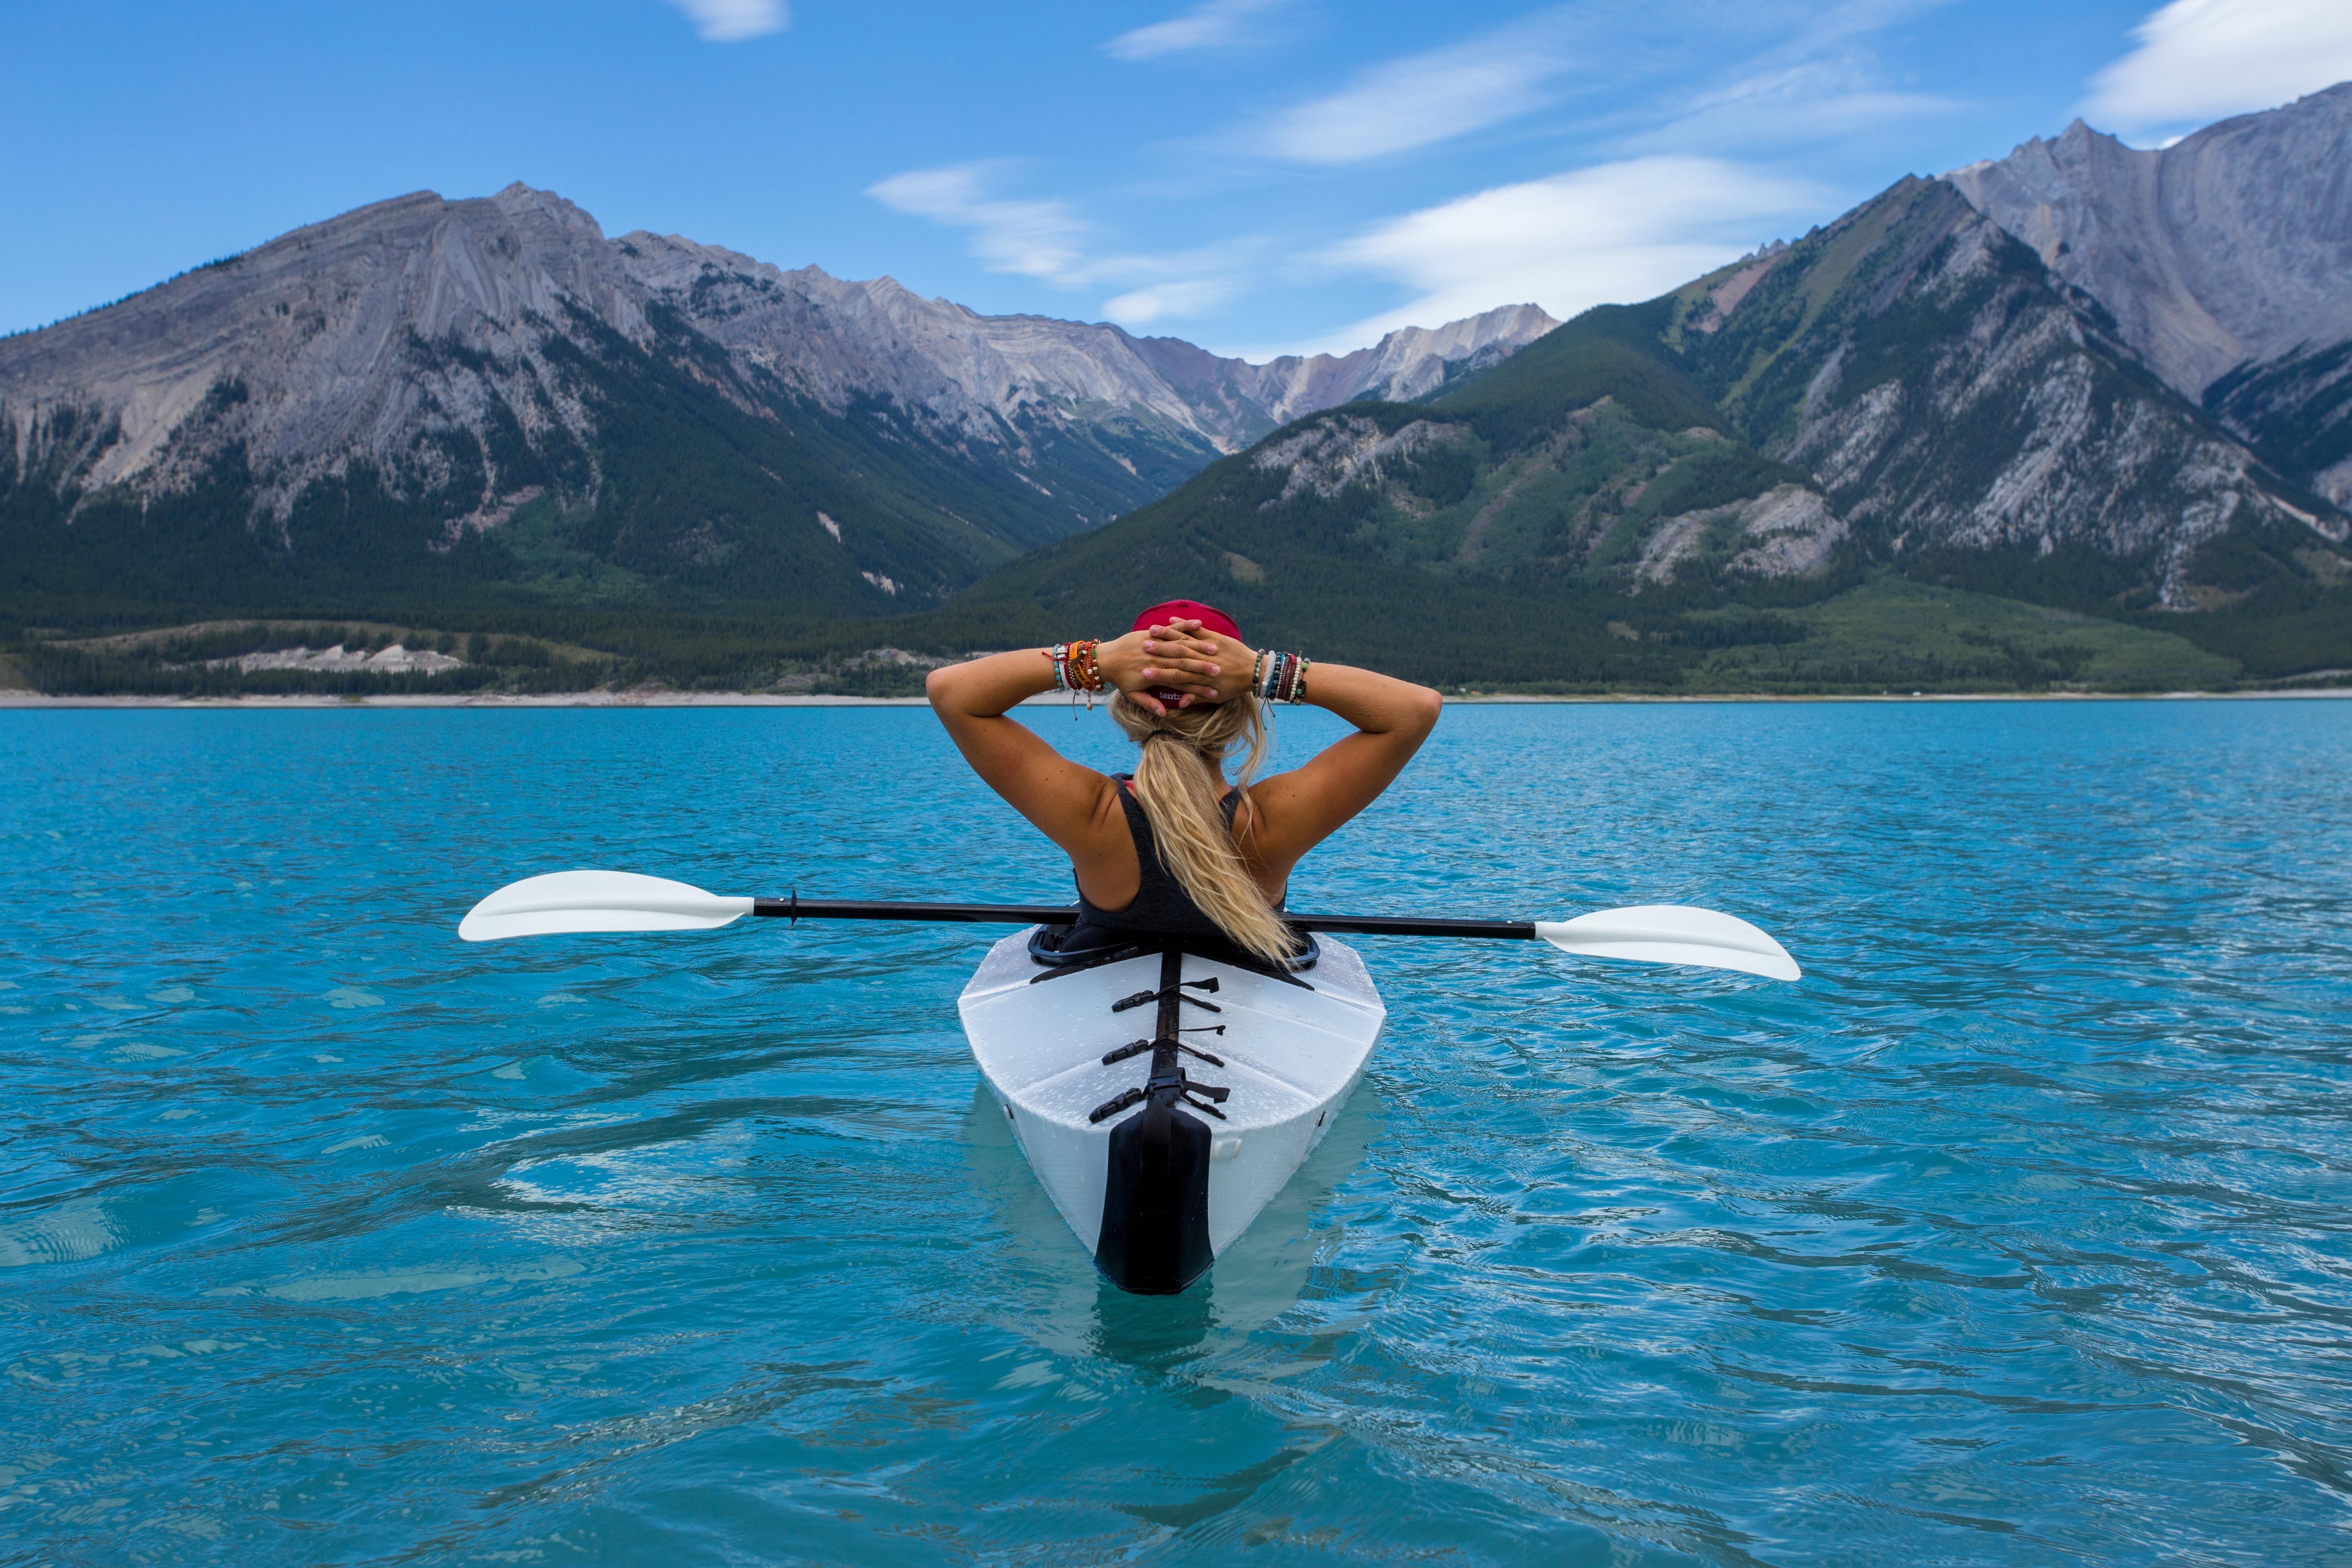 Woman relaxing in a kayak in a mountain lake